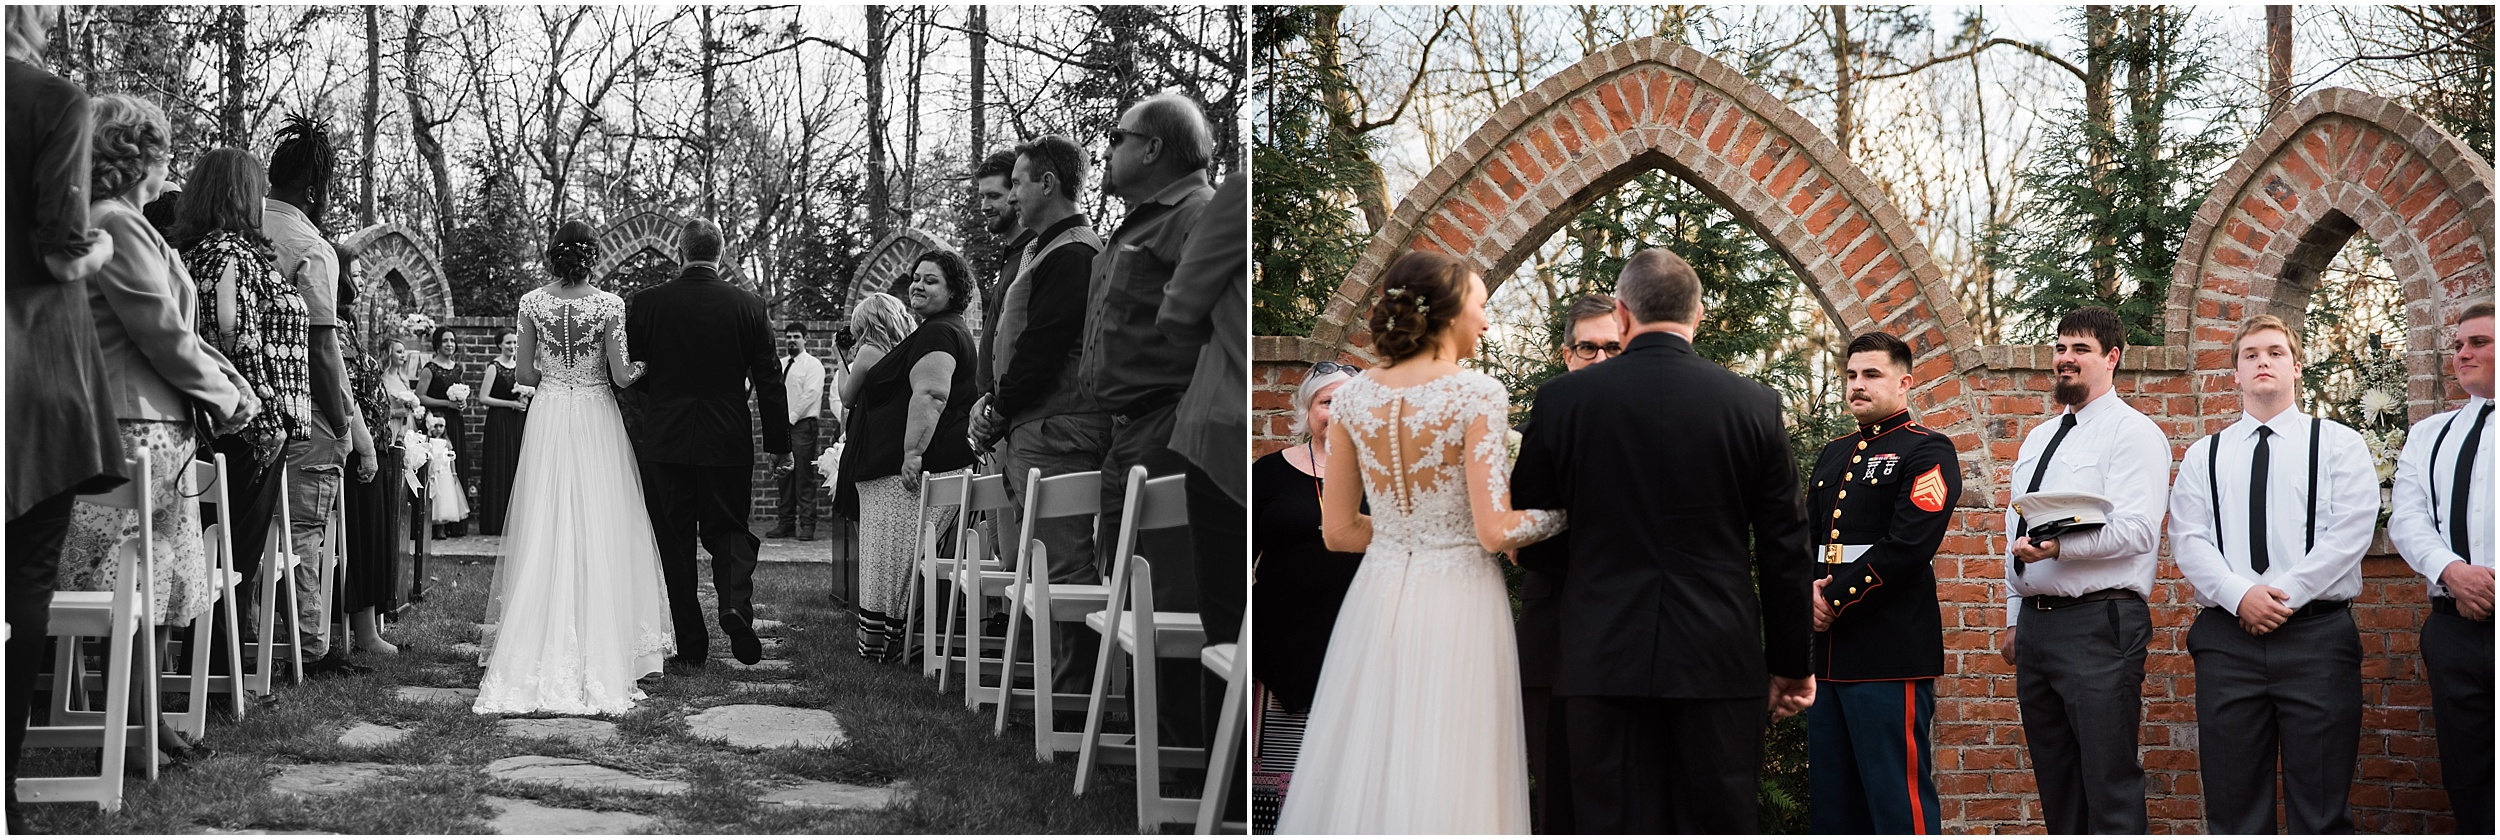 Ariel & Josh Southern Wedding in Monroe, North Carolina_0058.jpg